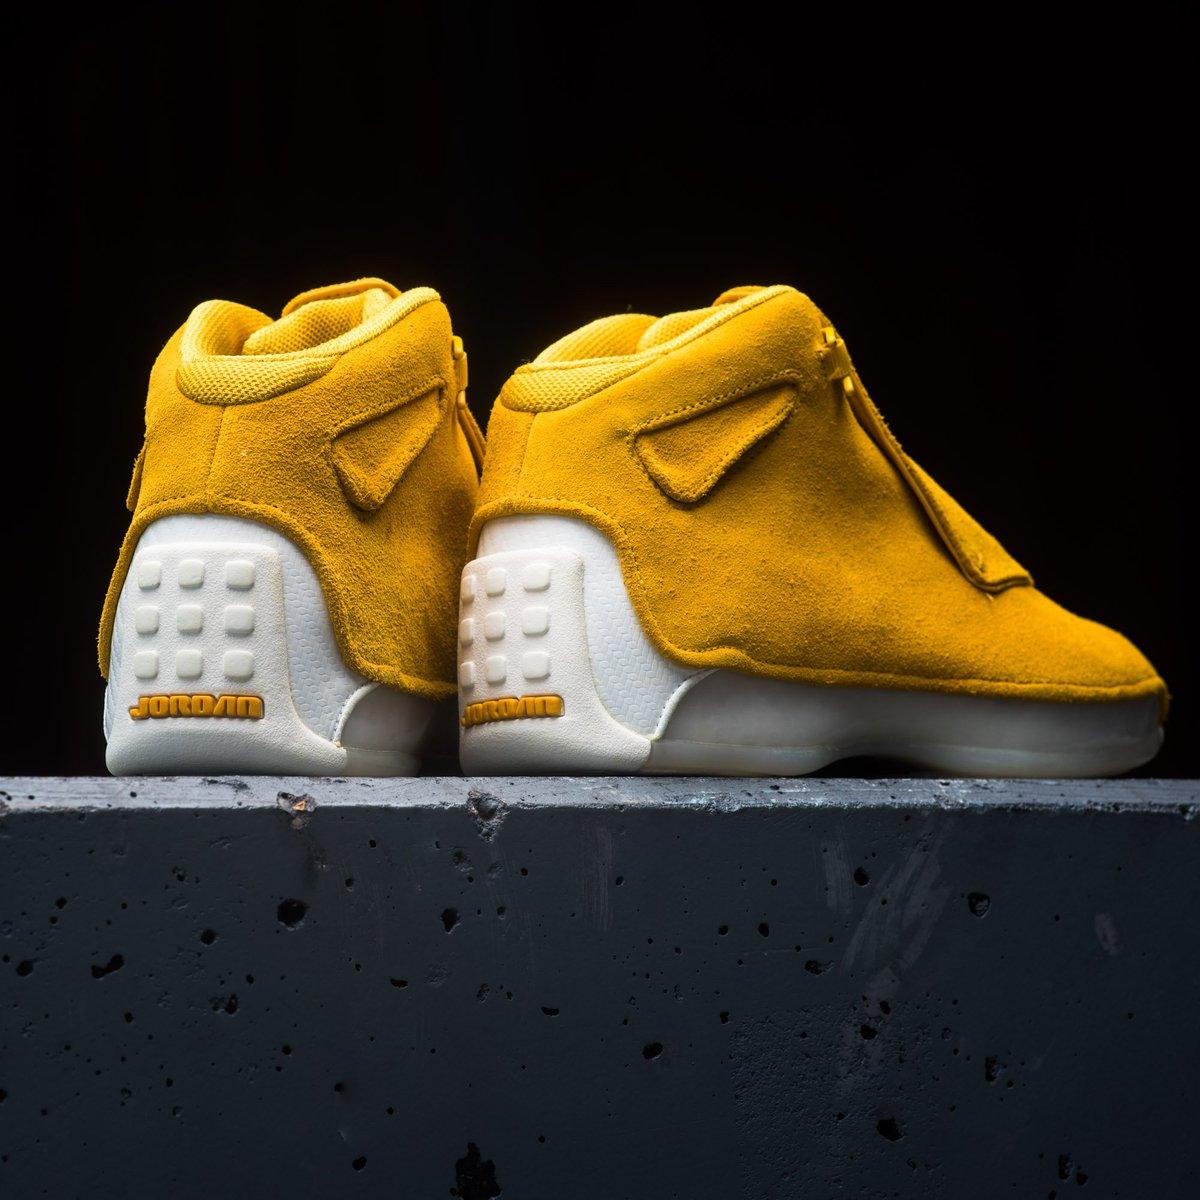 029aae7cd38d Now Available    Air Jordan 18 Retro Premium Rich Suede Pack     https   sneakerpolitics.com collections air-jordan-18-retro-premium-rich-suede  … ...